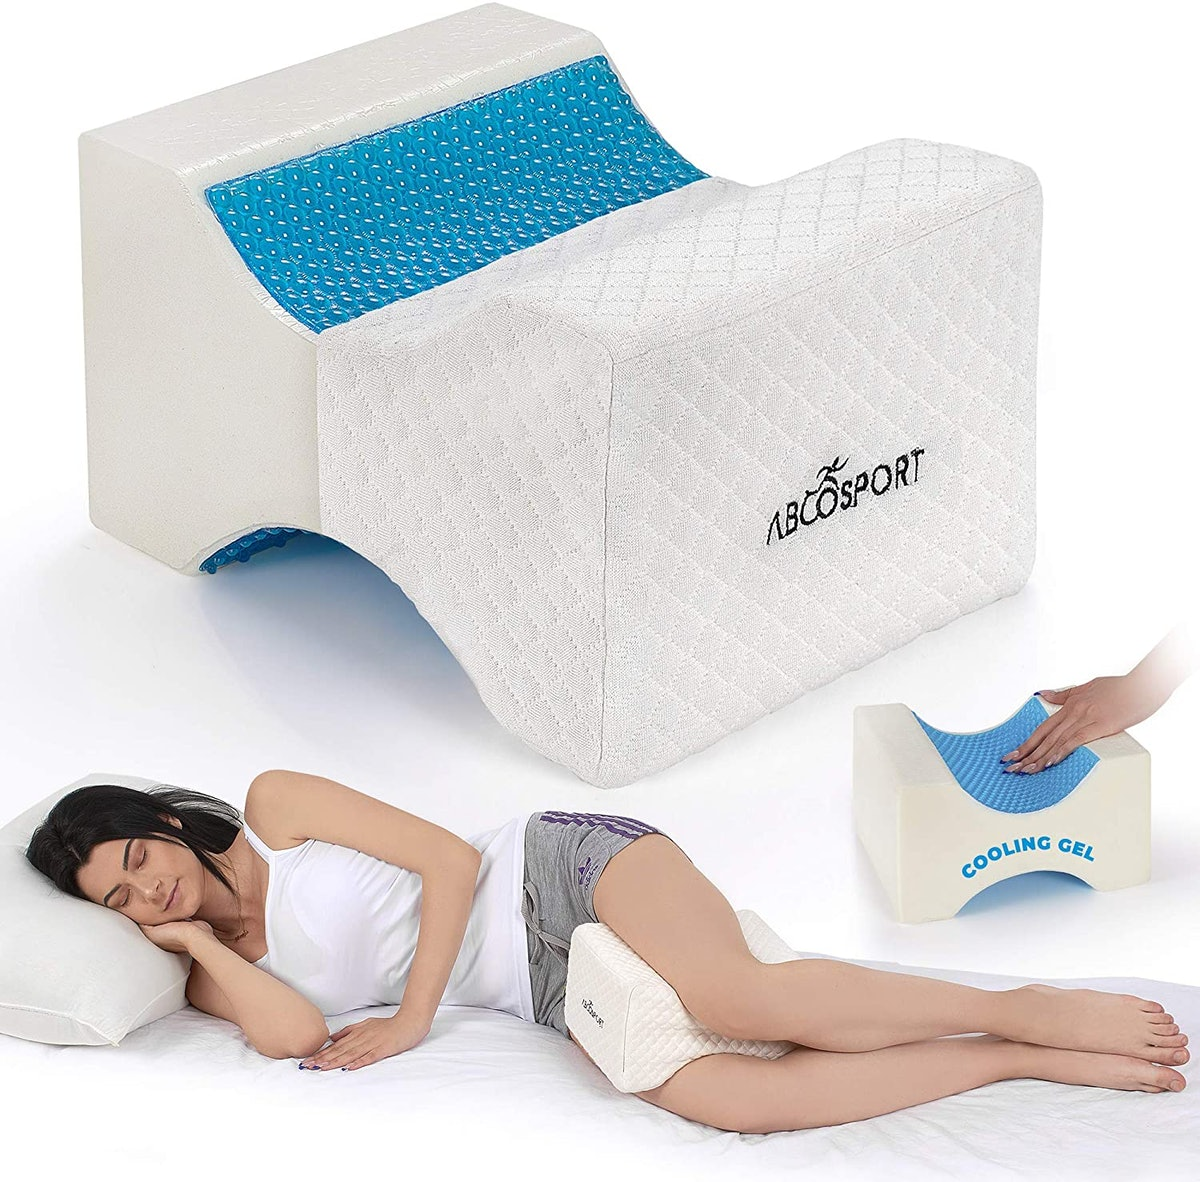 Abco Tech Memory Foam Knee Pillow